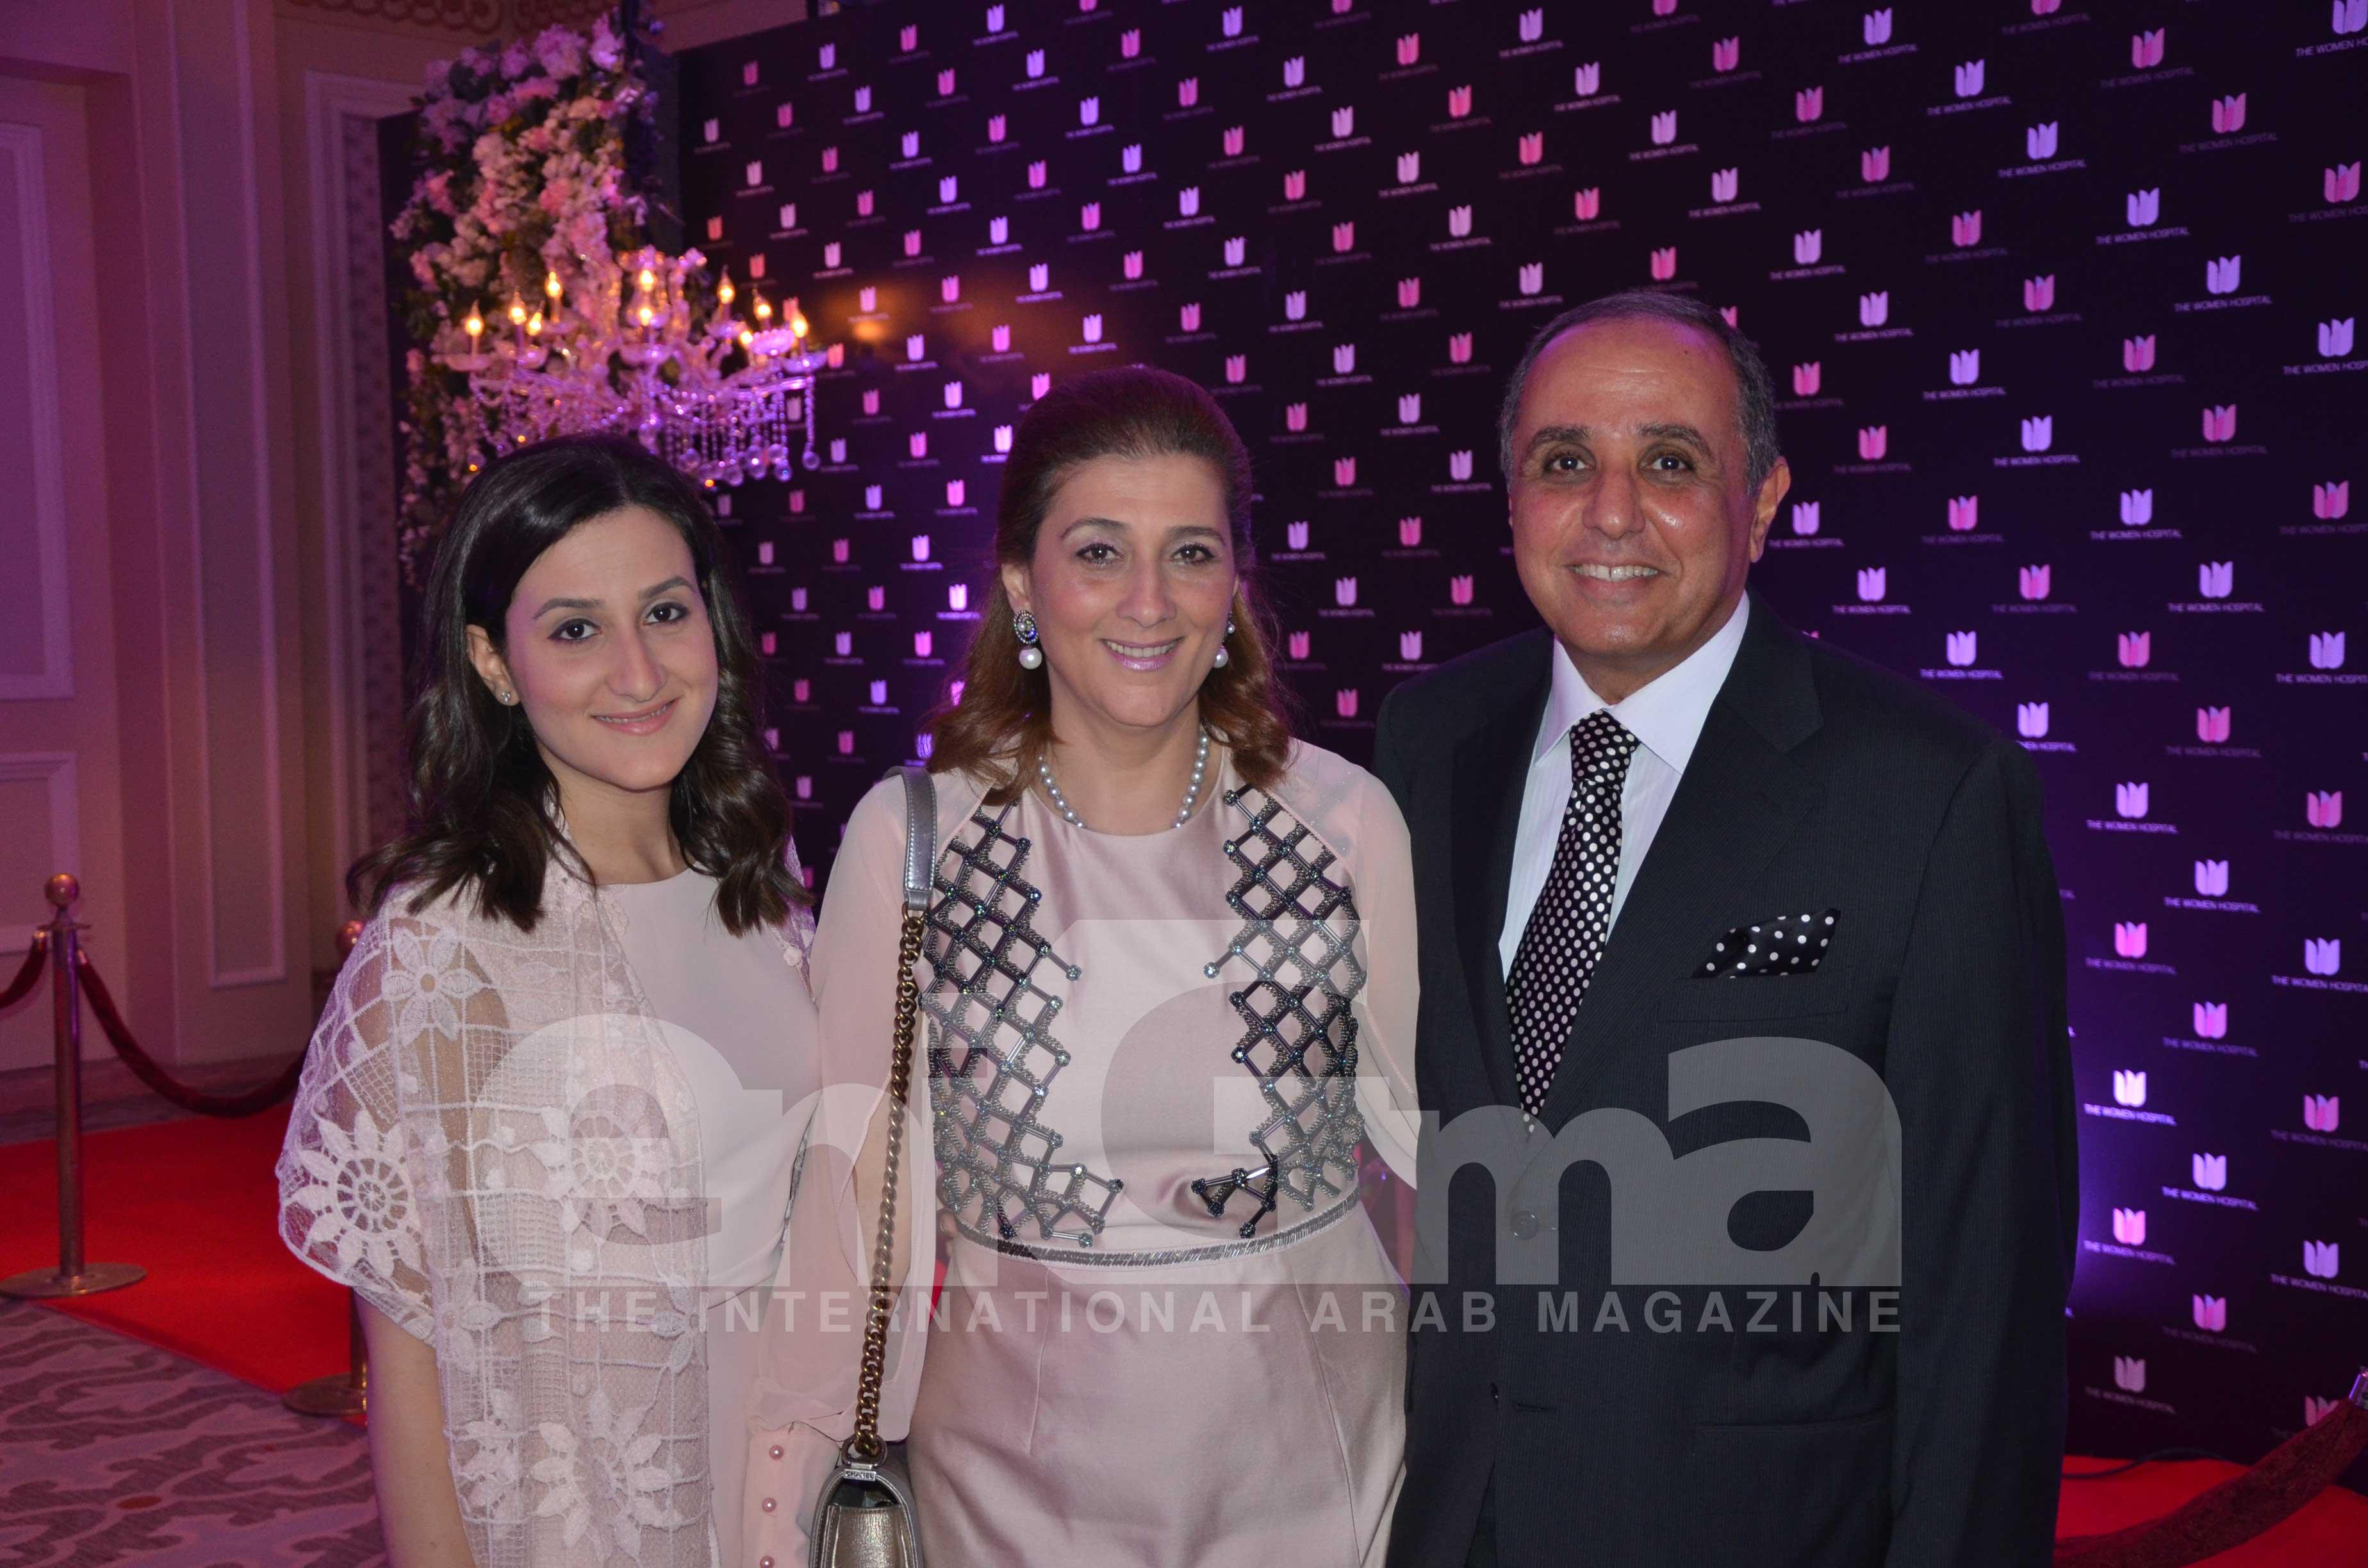 Ms. Nadine Shawki & Mrs. and Mr. Mohamed Shawki